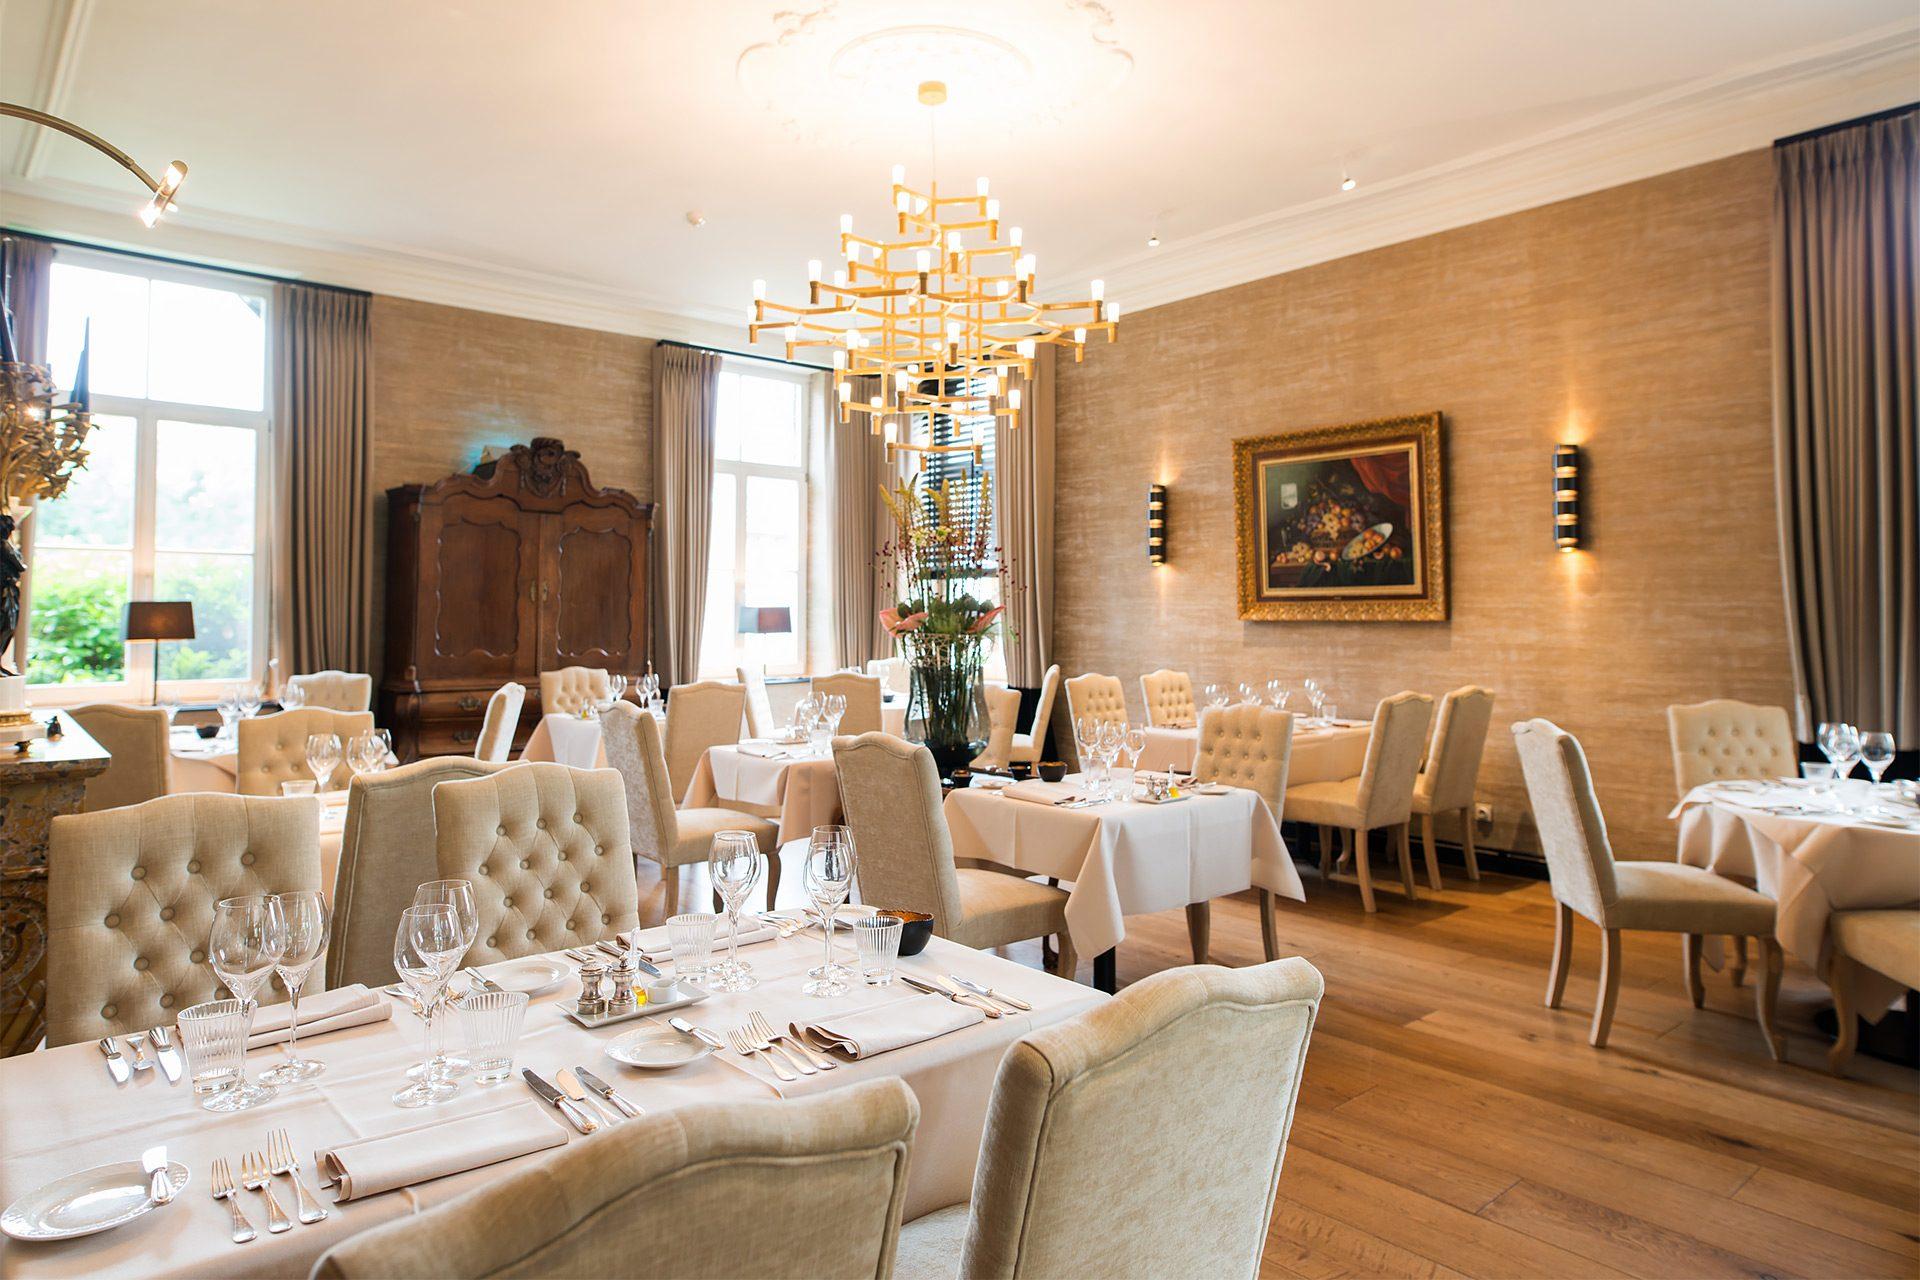 "Hôtel Restaurant <span class=""hof-de-draeck"">HofdeDraeck</span> à Teuven - Hof De Draeck"